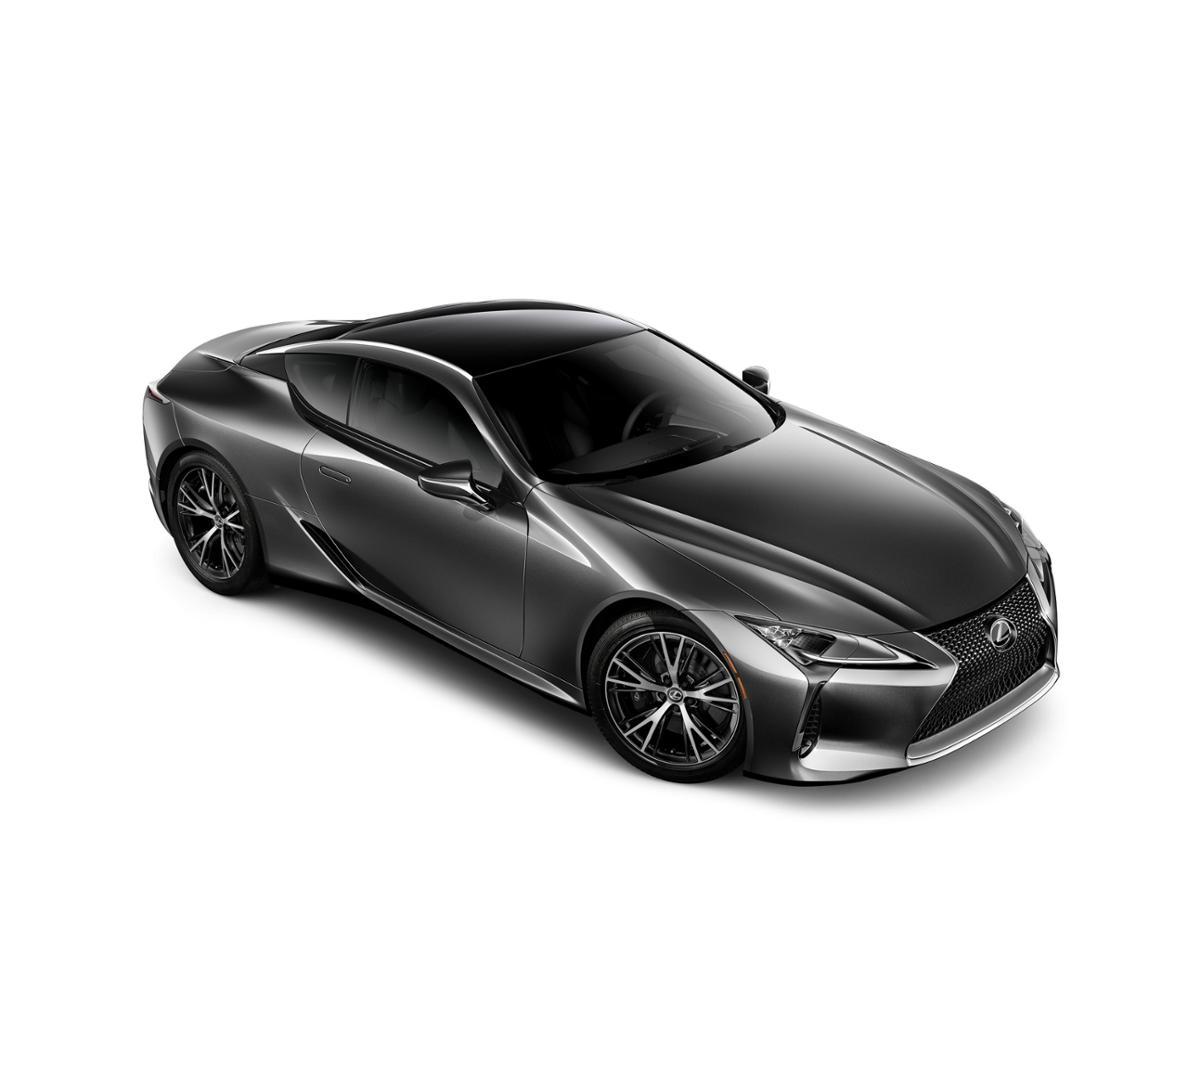 2019 Lexus LC 500 52027